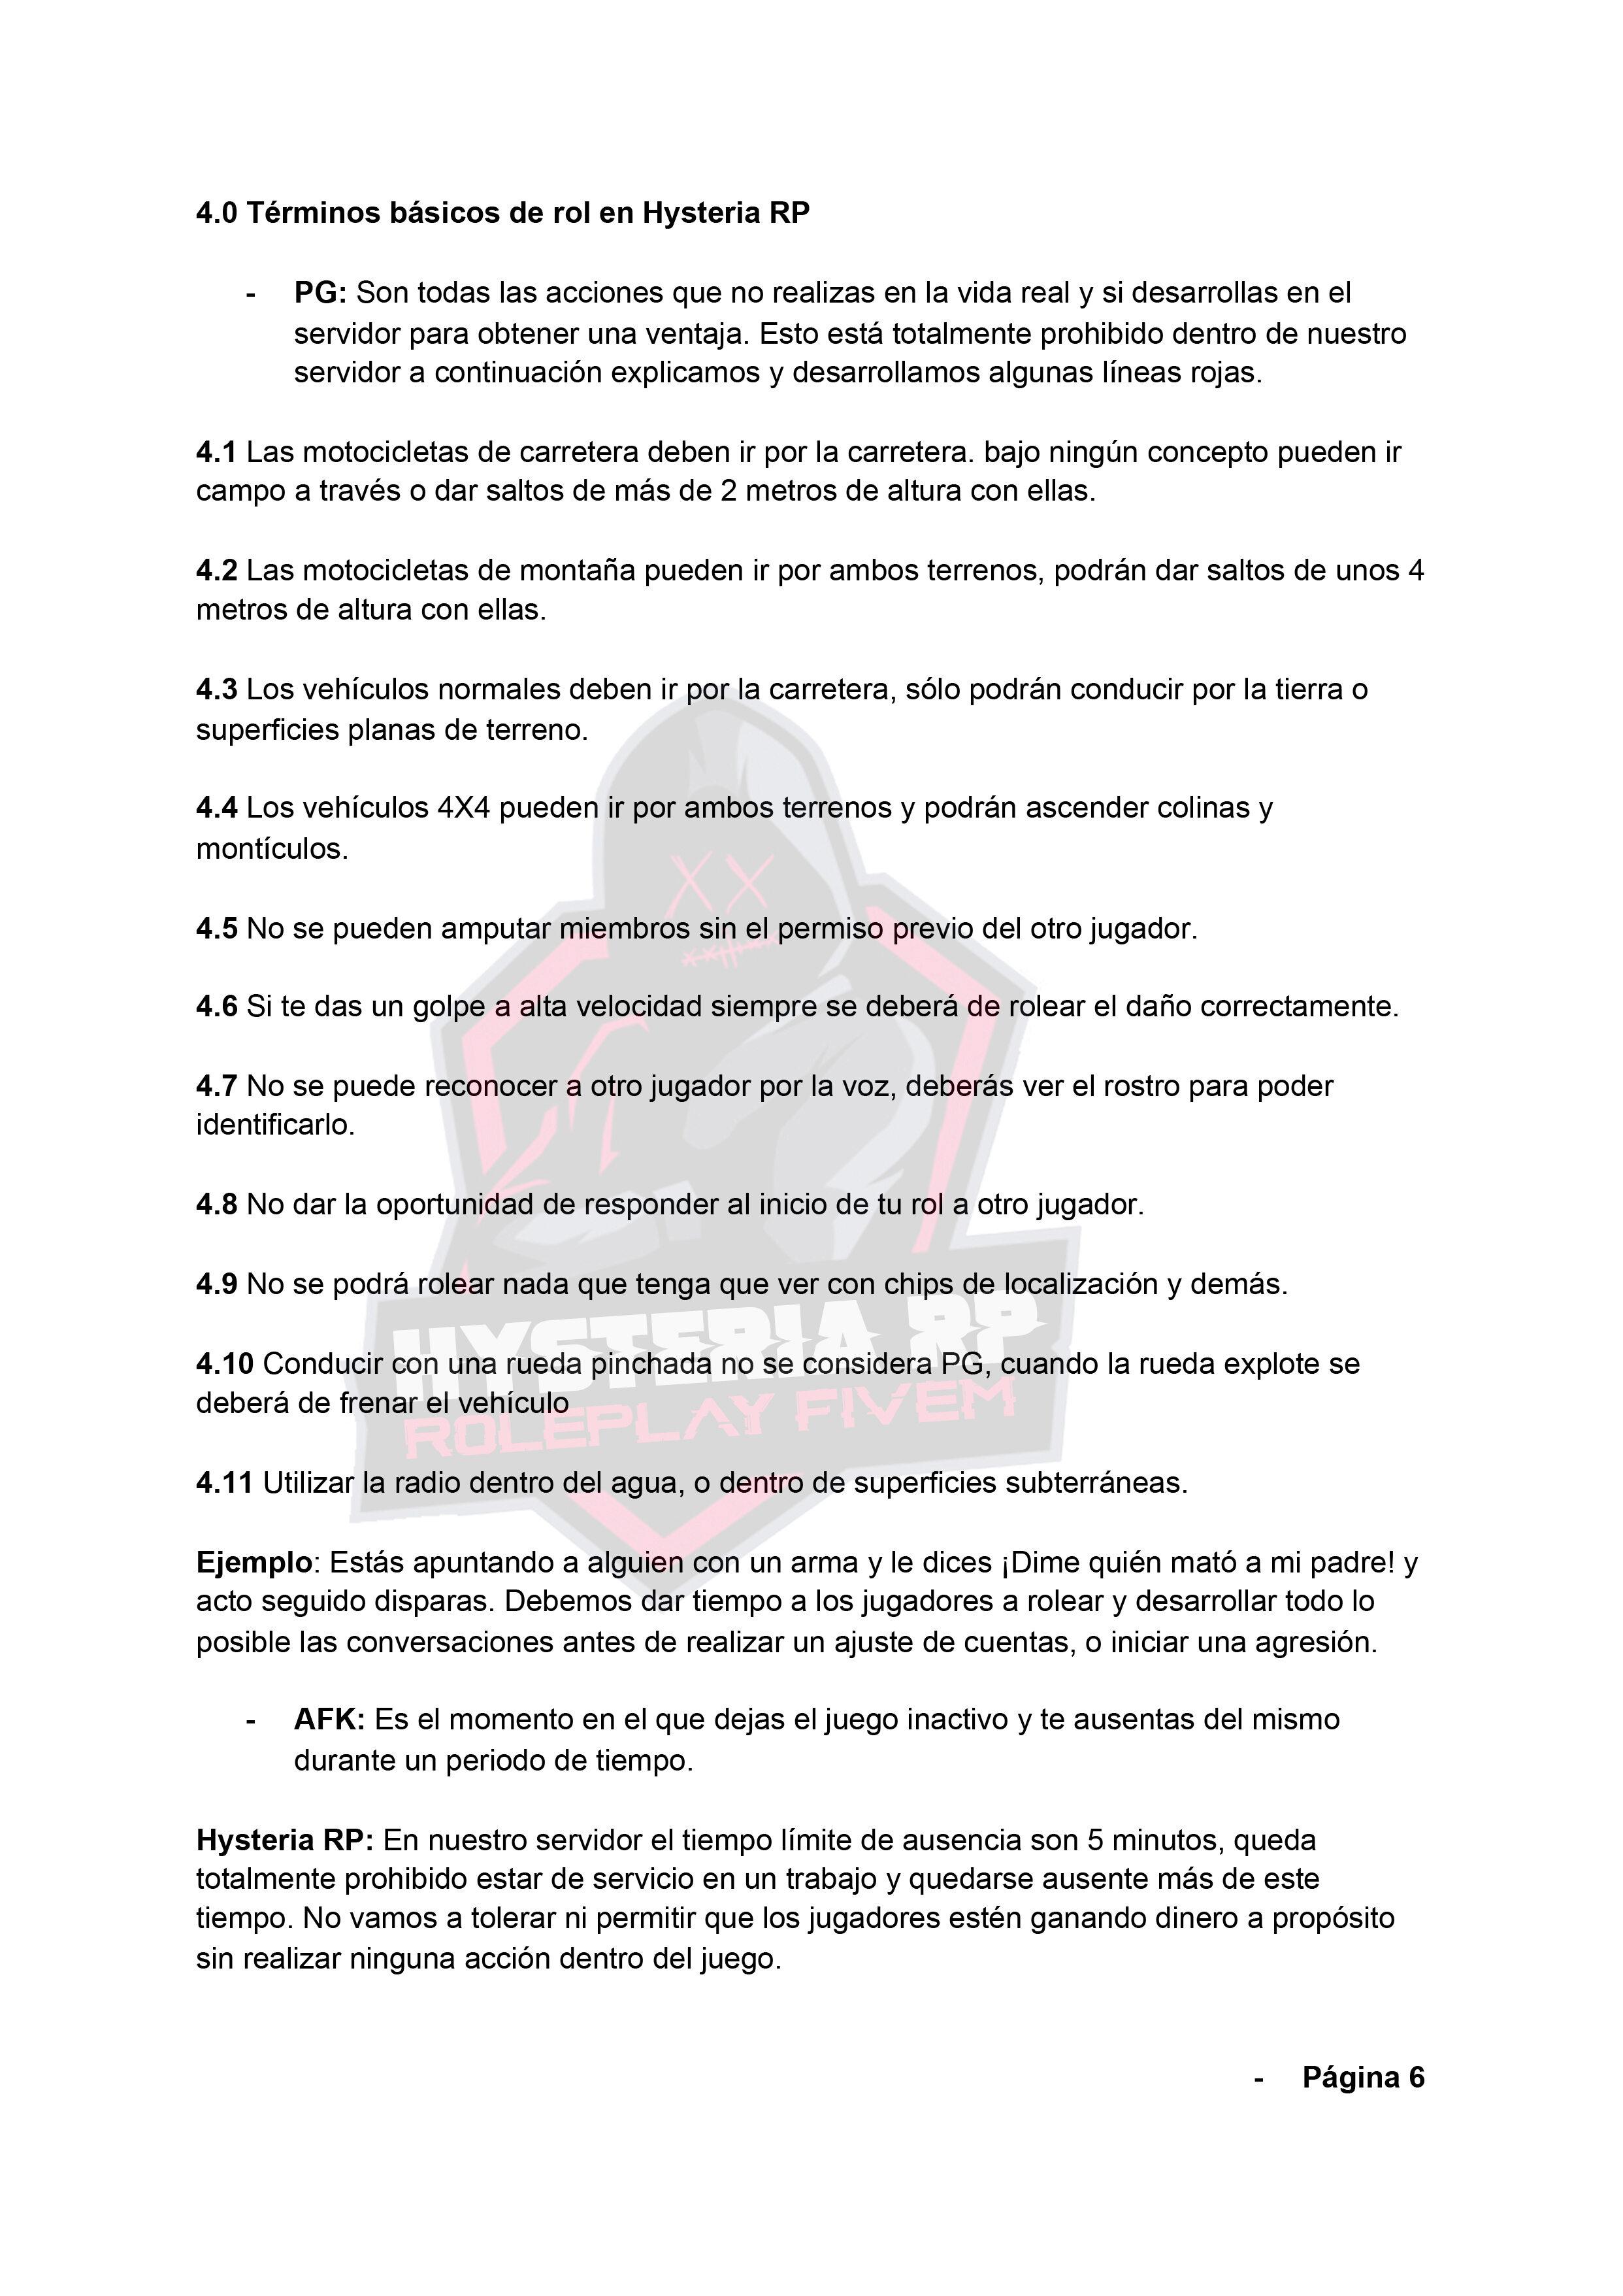 Normativa General | Hysteria RP Normat15